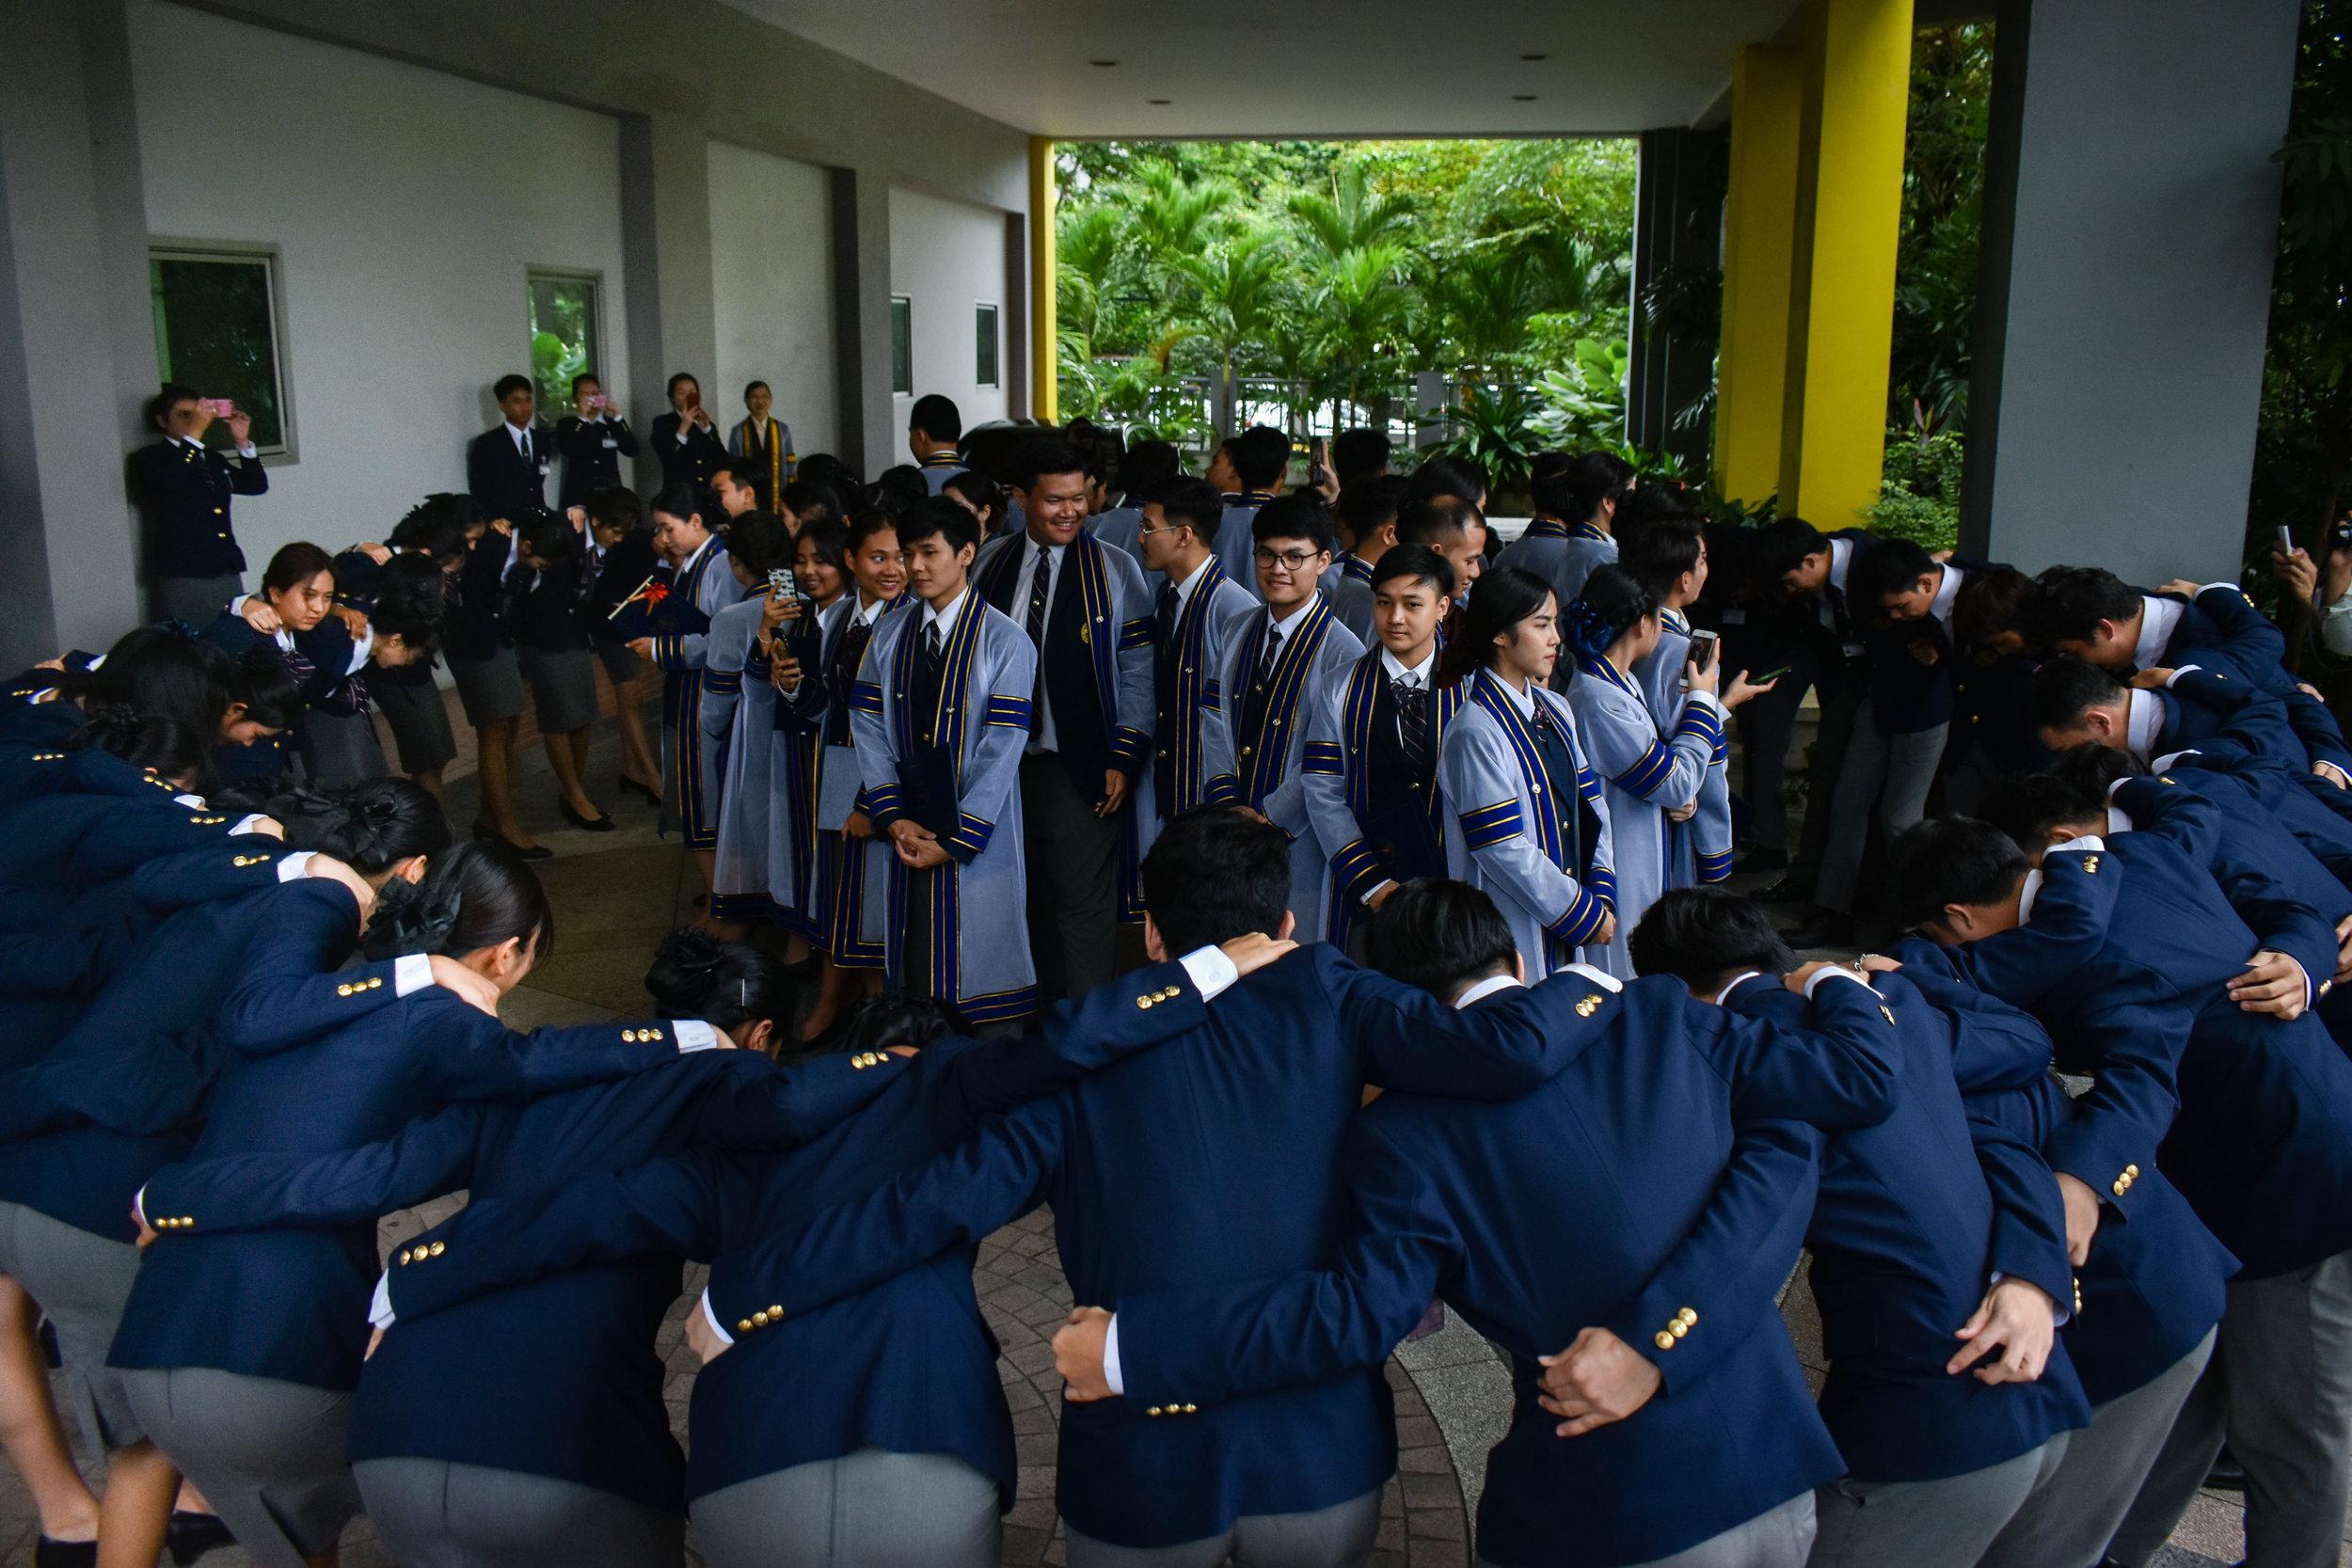 graduation 2018 (53 of 61).jpg